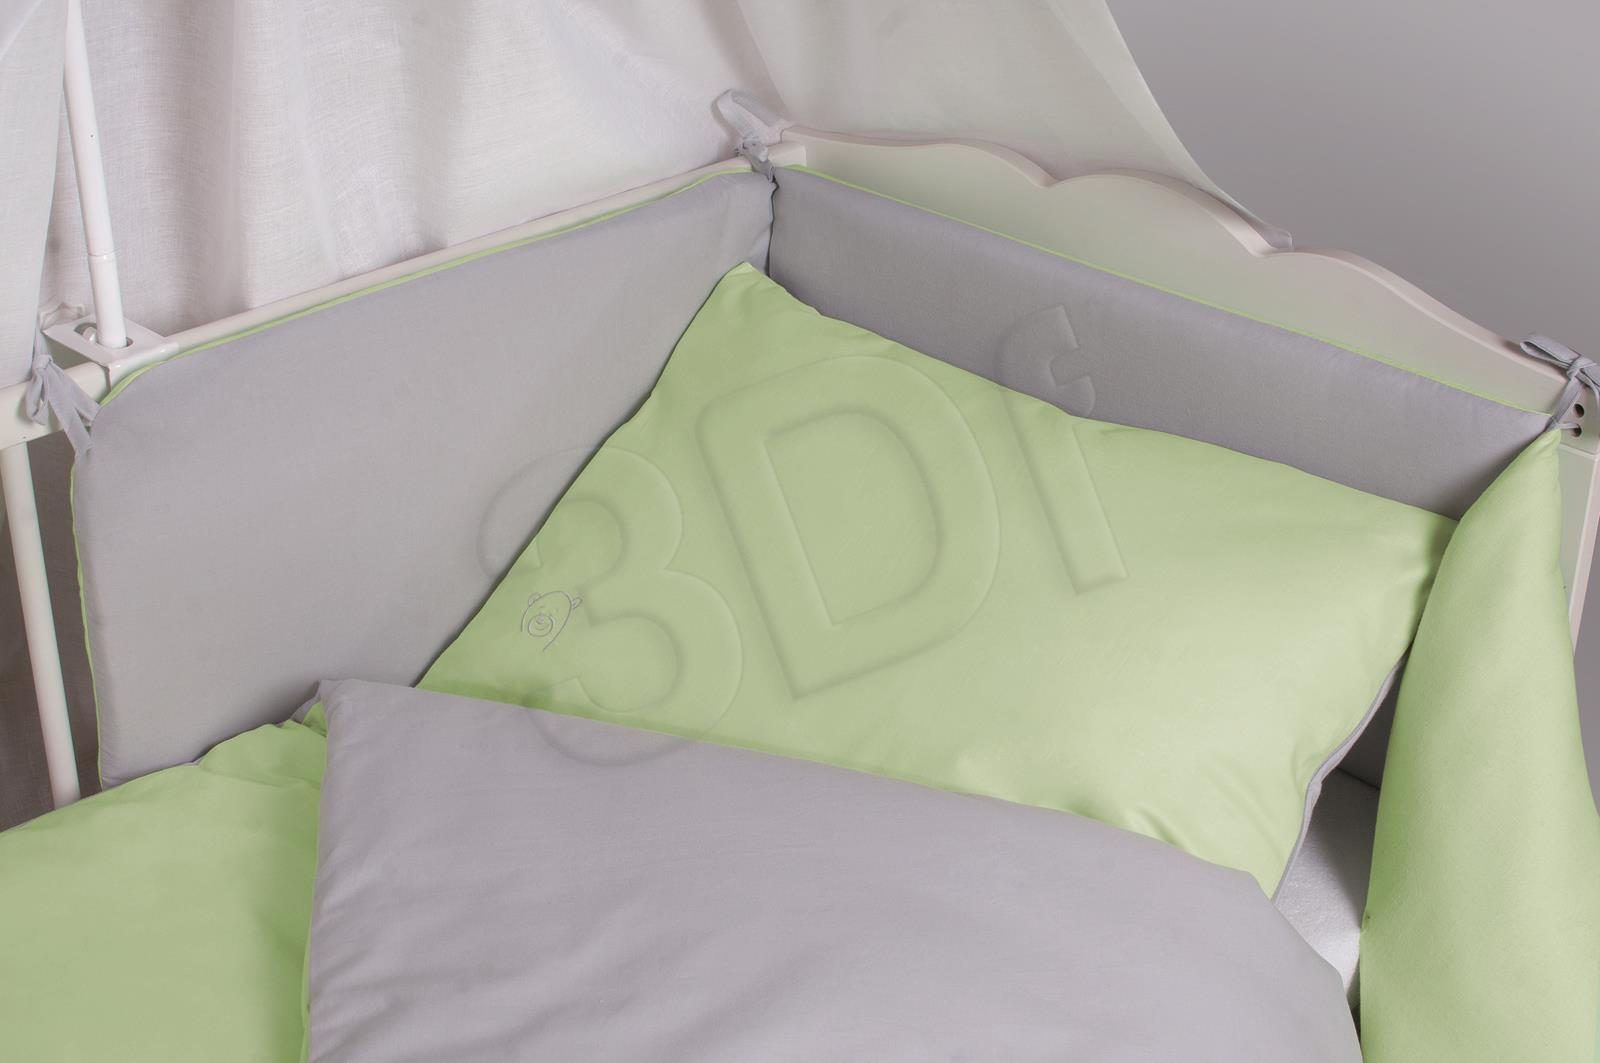 Bed linen Matex  TDOBW2-52 (135x100 cm, 40x60 cm; gray color, green color) TDOBW2-52 Gultas veļa